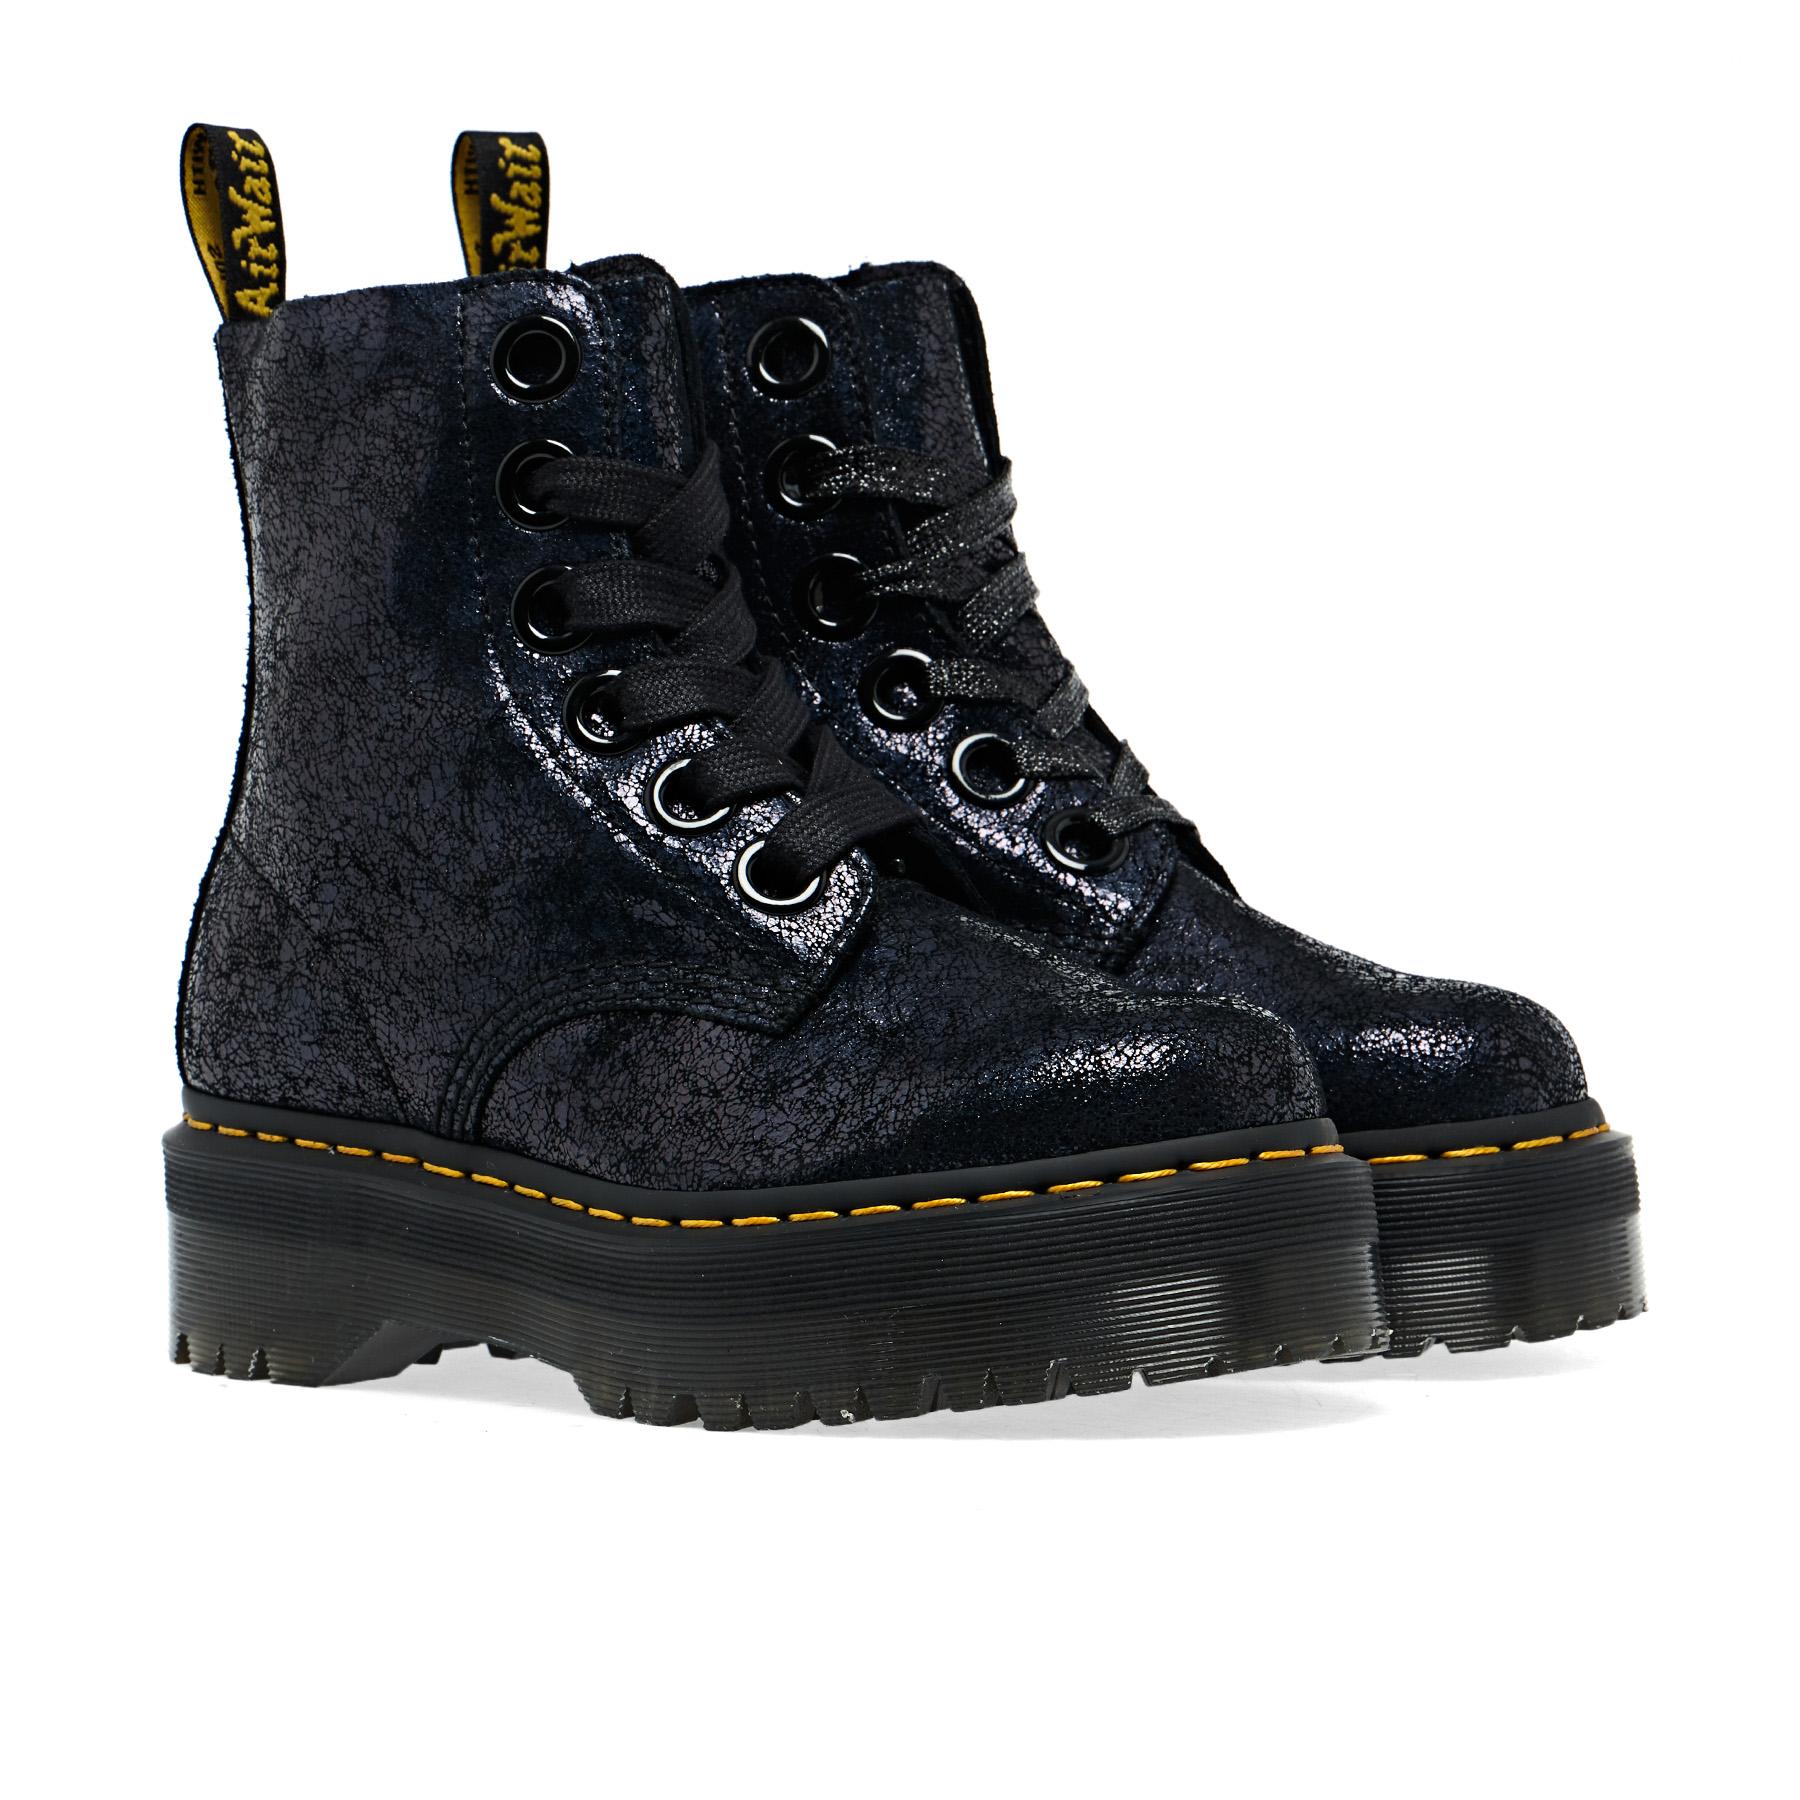 Dr Martens Molly Women's Boots - Black